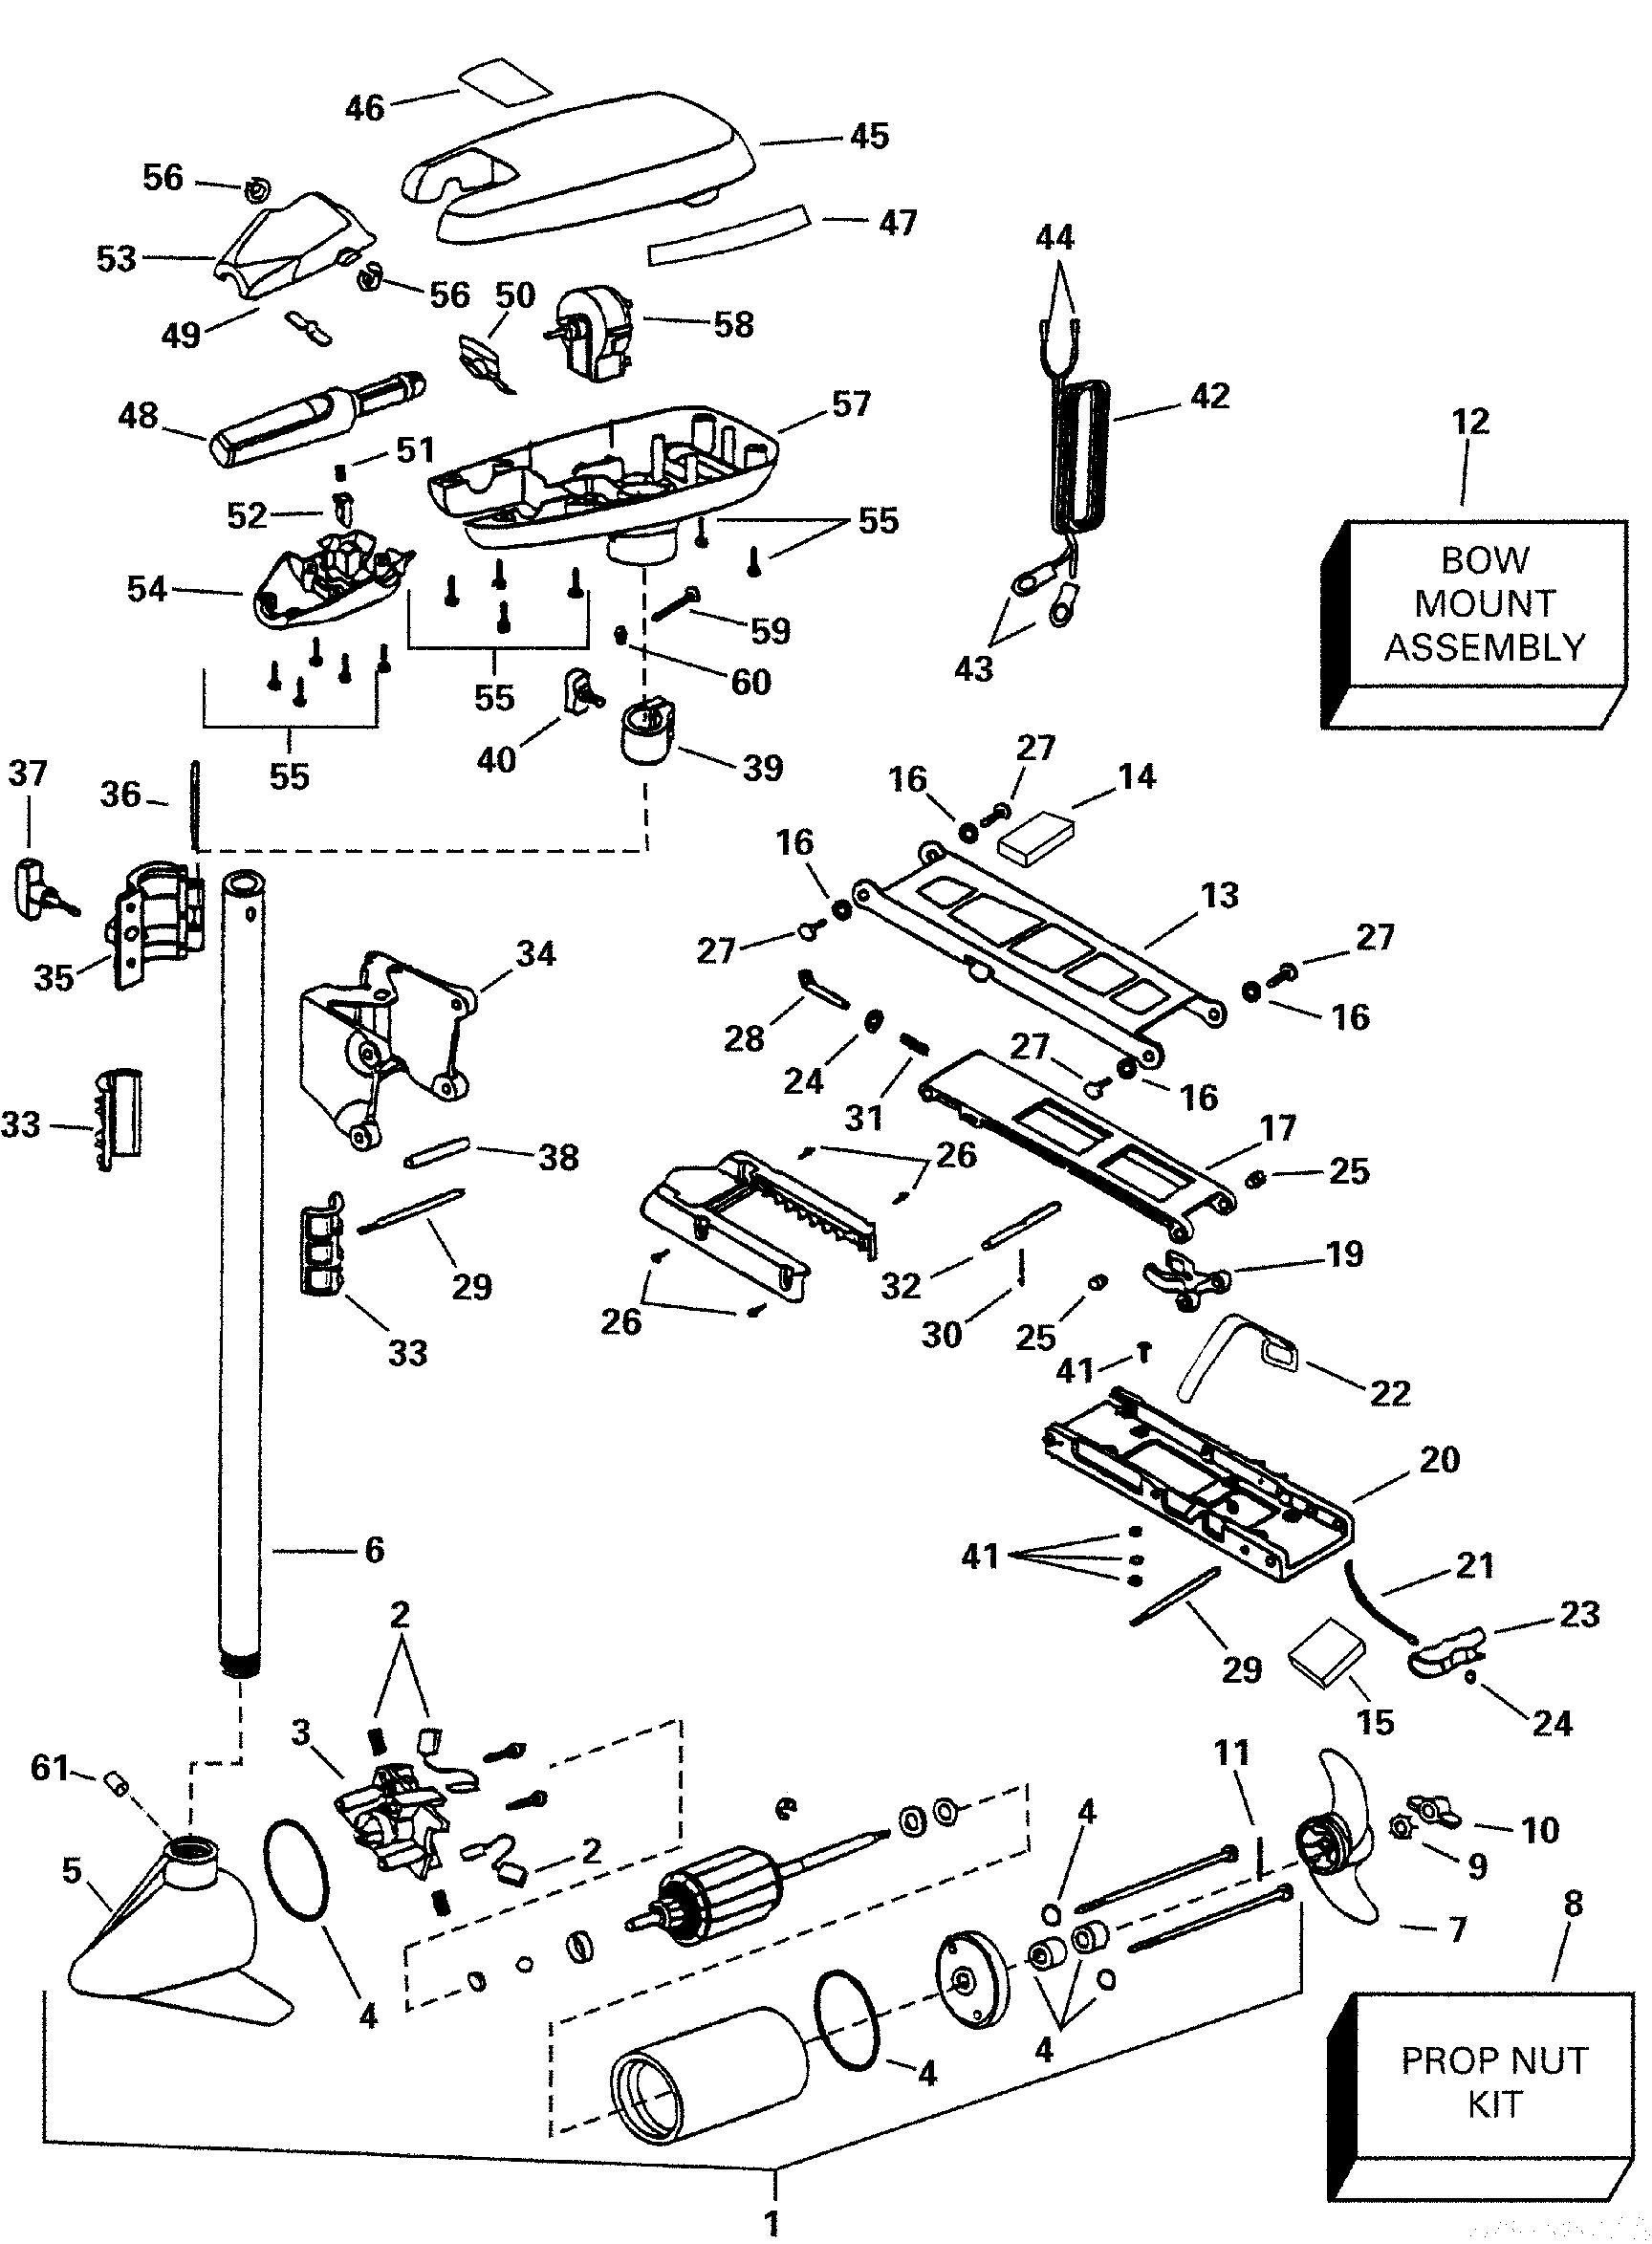 brp evinrude en 2000 12 volt p n 773162 scout 40h 2000 Bradley Motor Diagram ref description qty required price 1 motor assembly